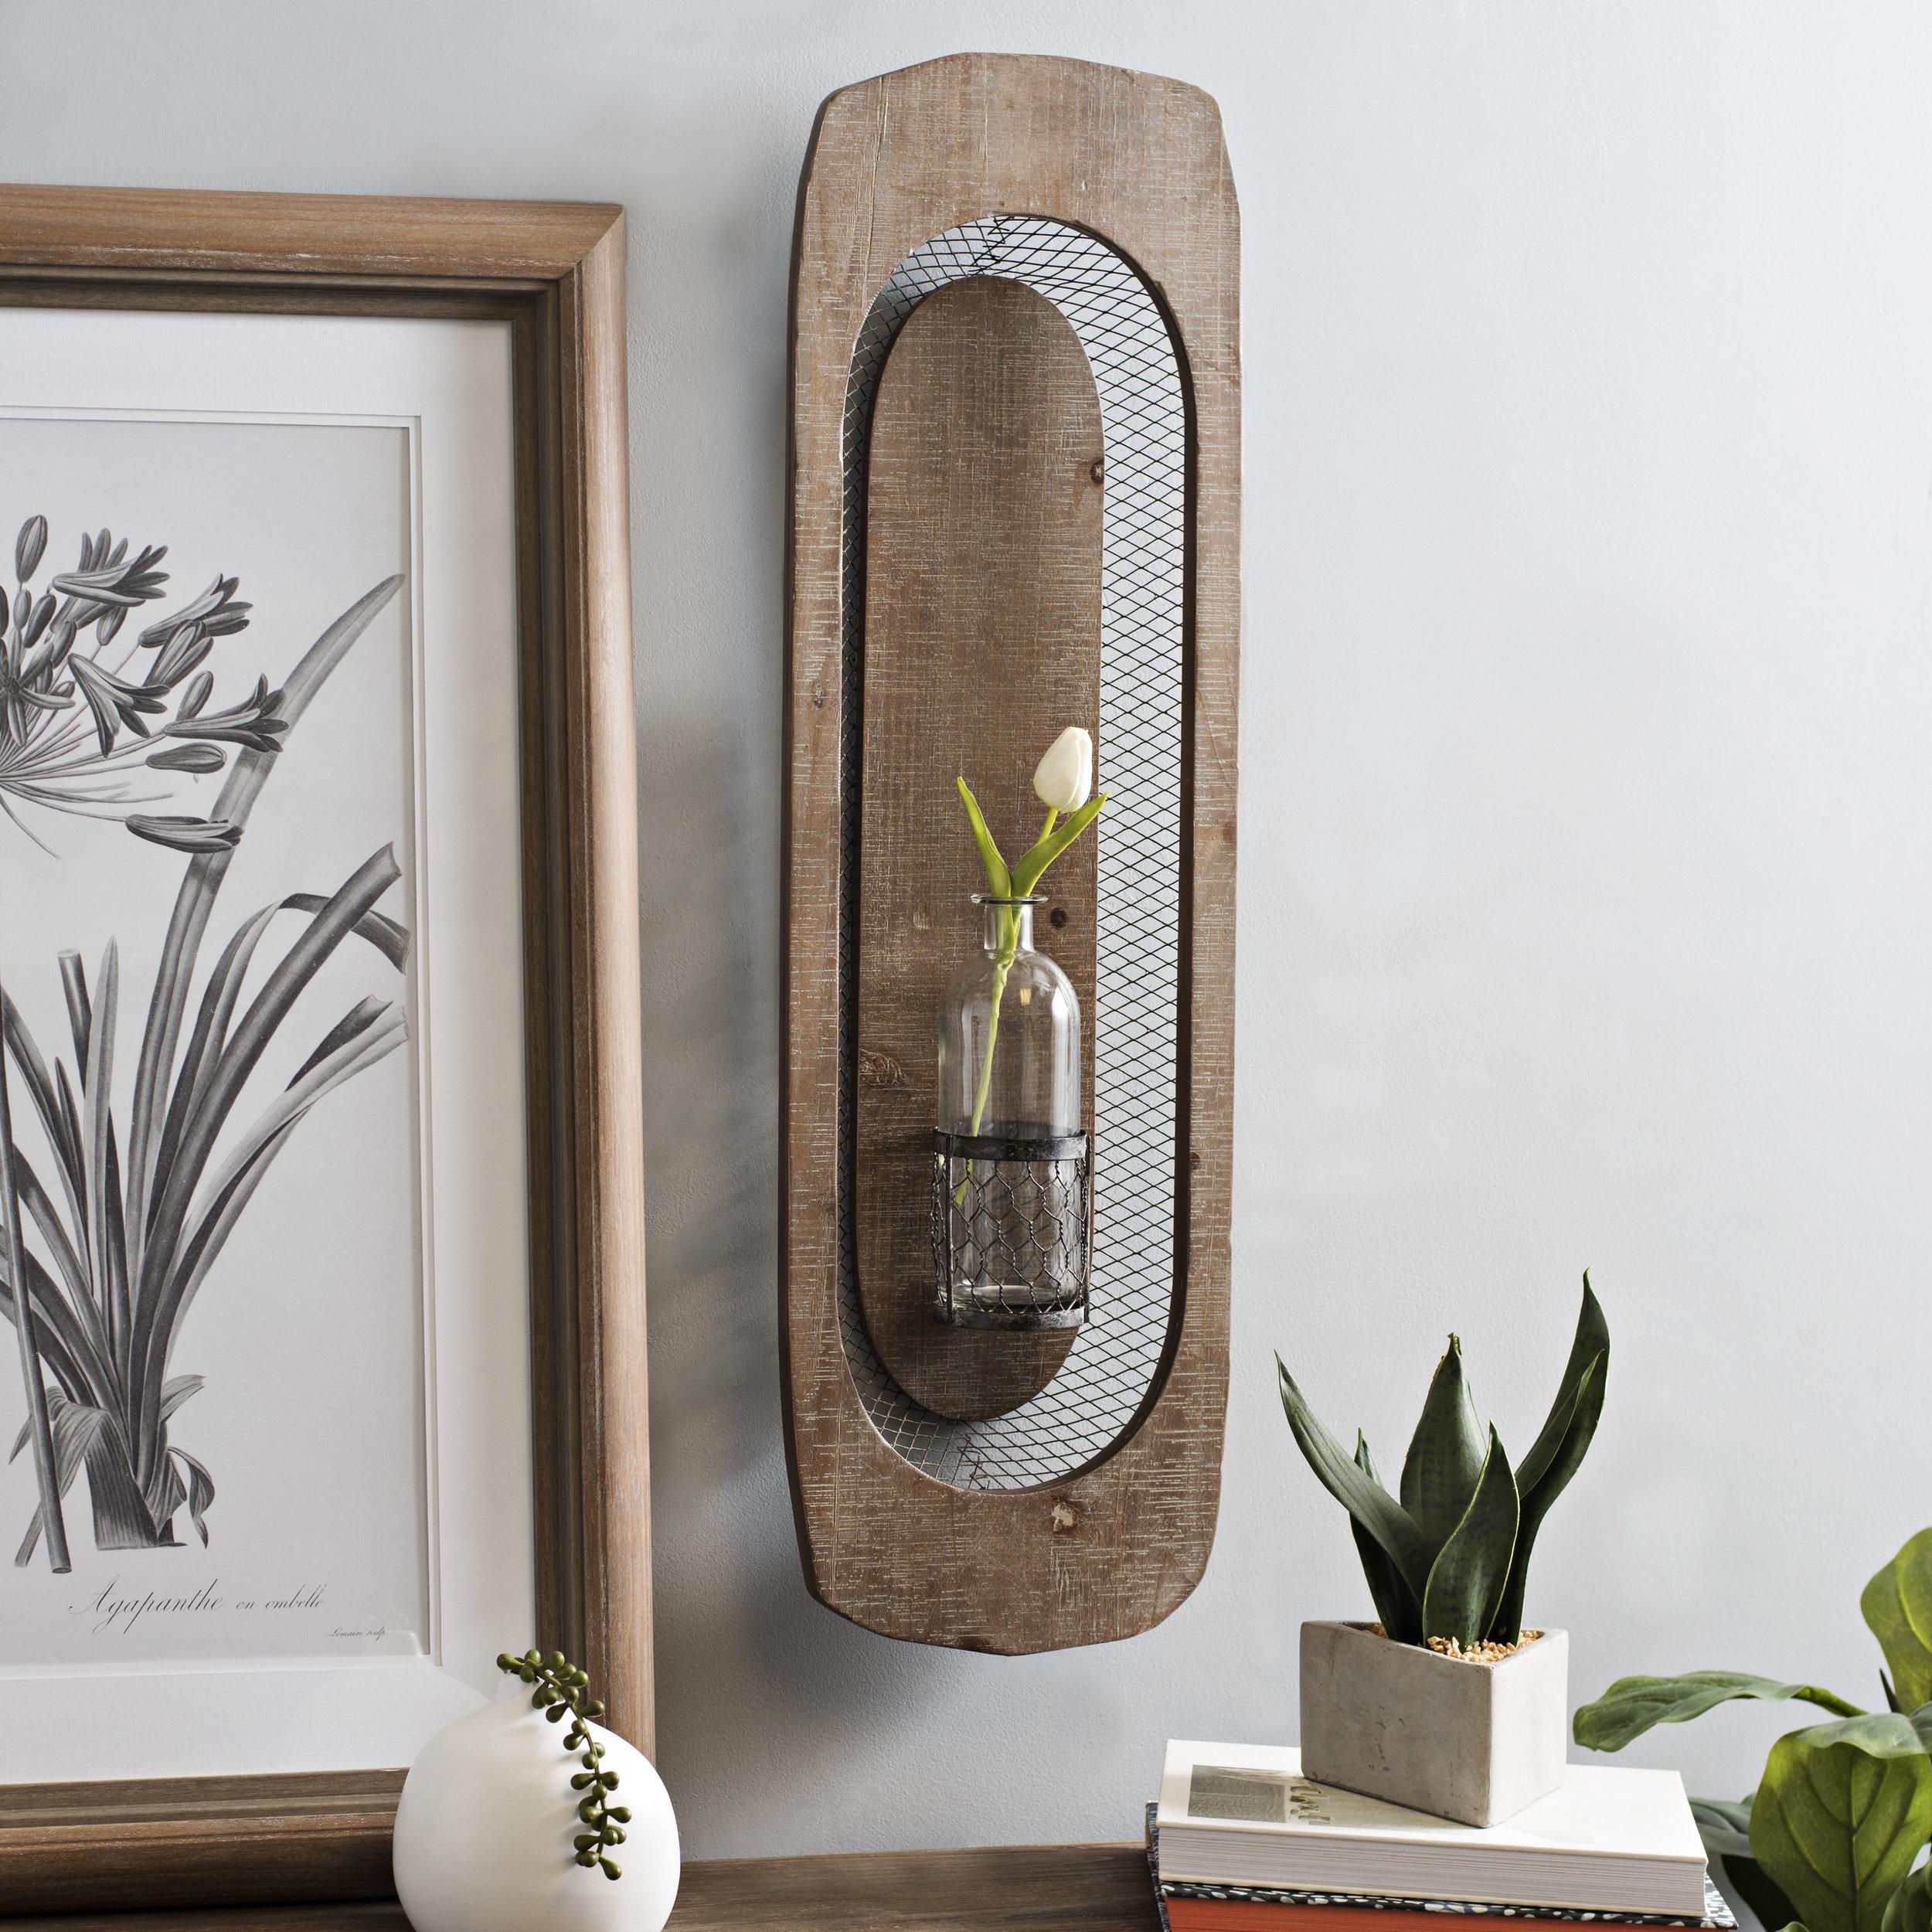 Kirkland's - Wooden Boat Wall Vase